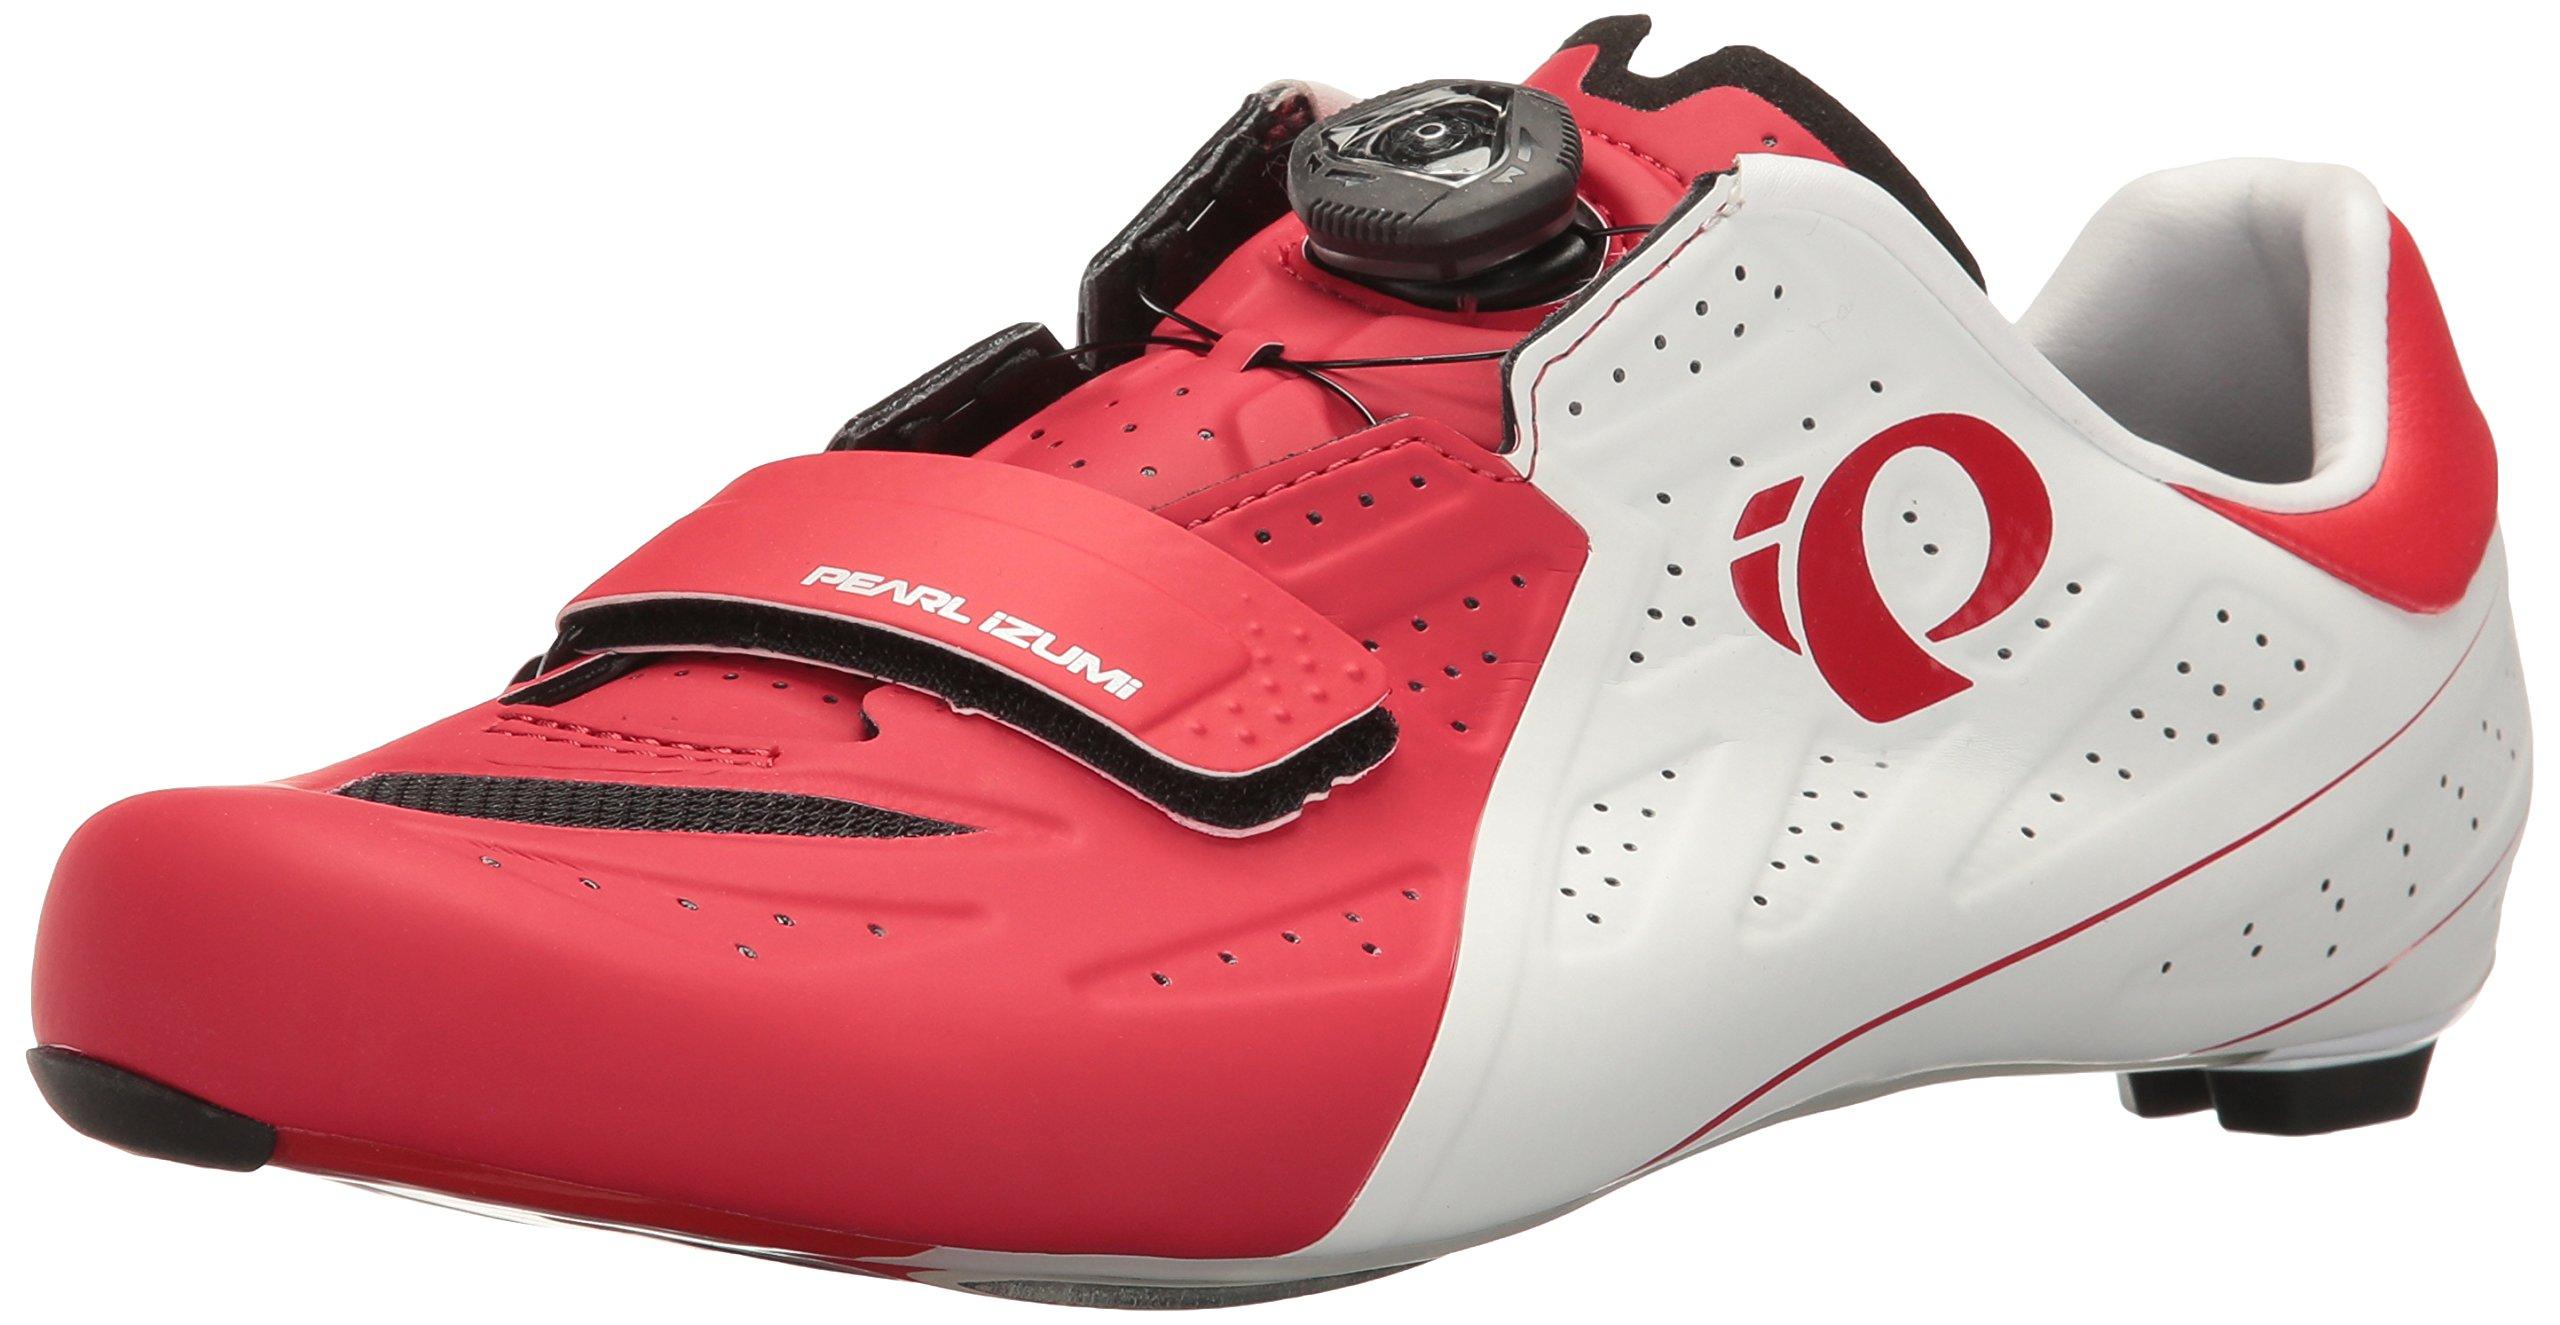 Pearl Izumi Men's Elite Road V5 Cycling-Footwear, White/True Red, 45 EU/10.8 D US